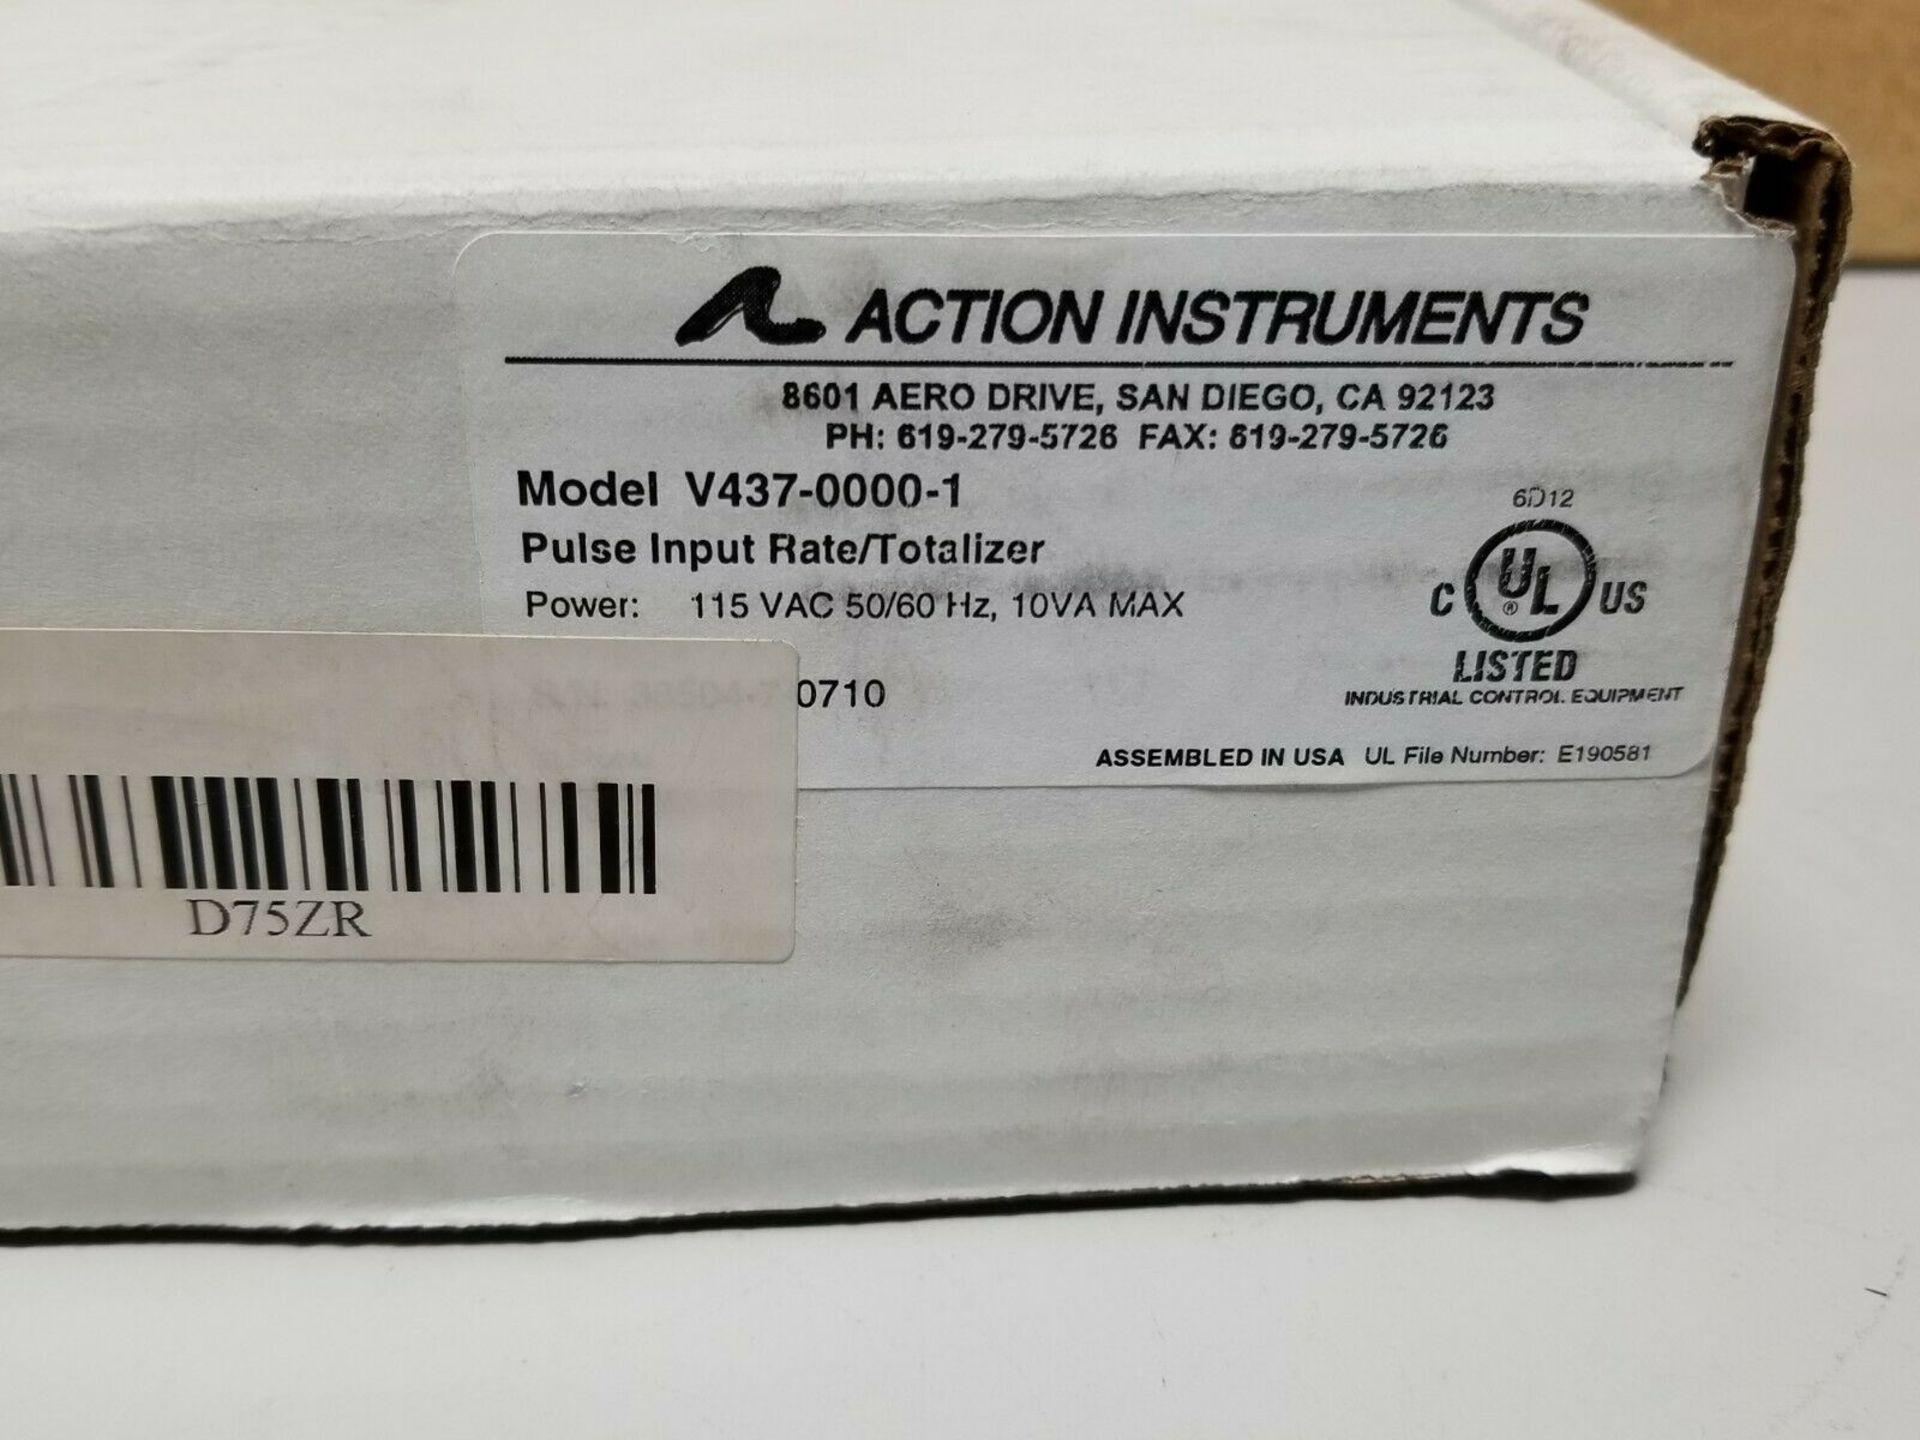 NEW ACTION INSTR VISIPAK RATE/TOTALIZER PANEL METER V437-0000- - Image 2 of 7